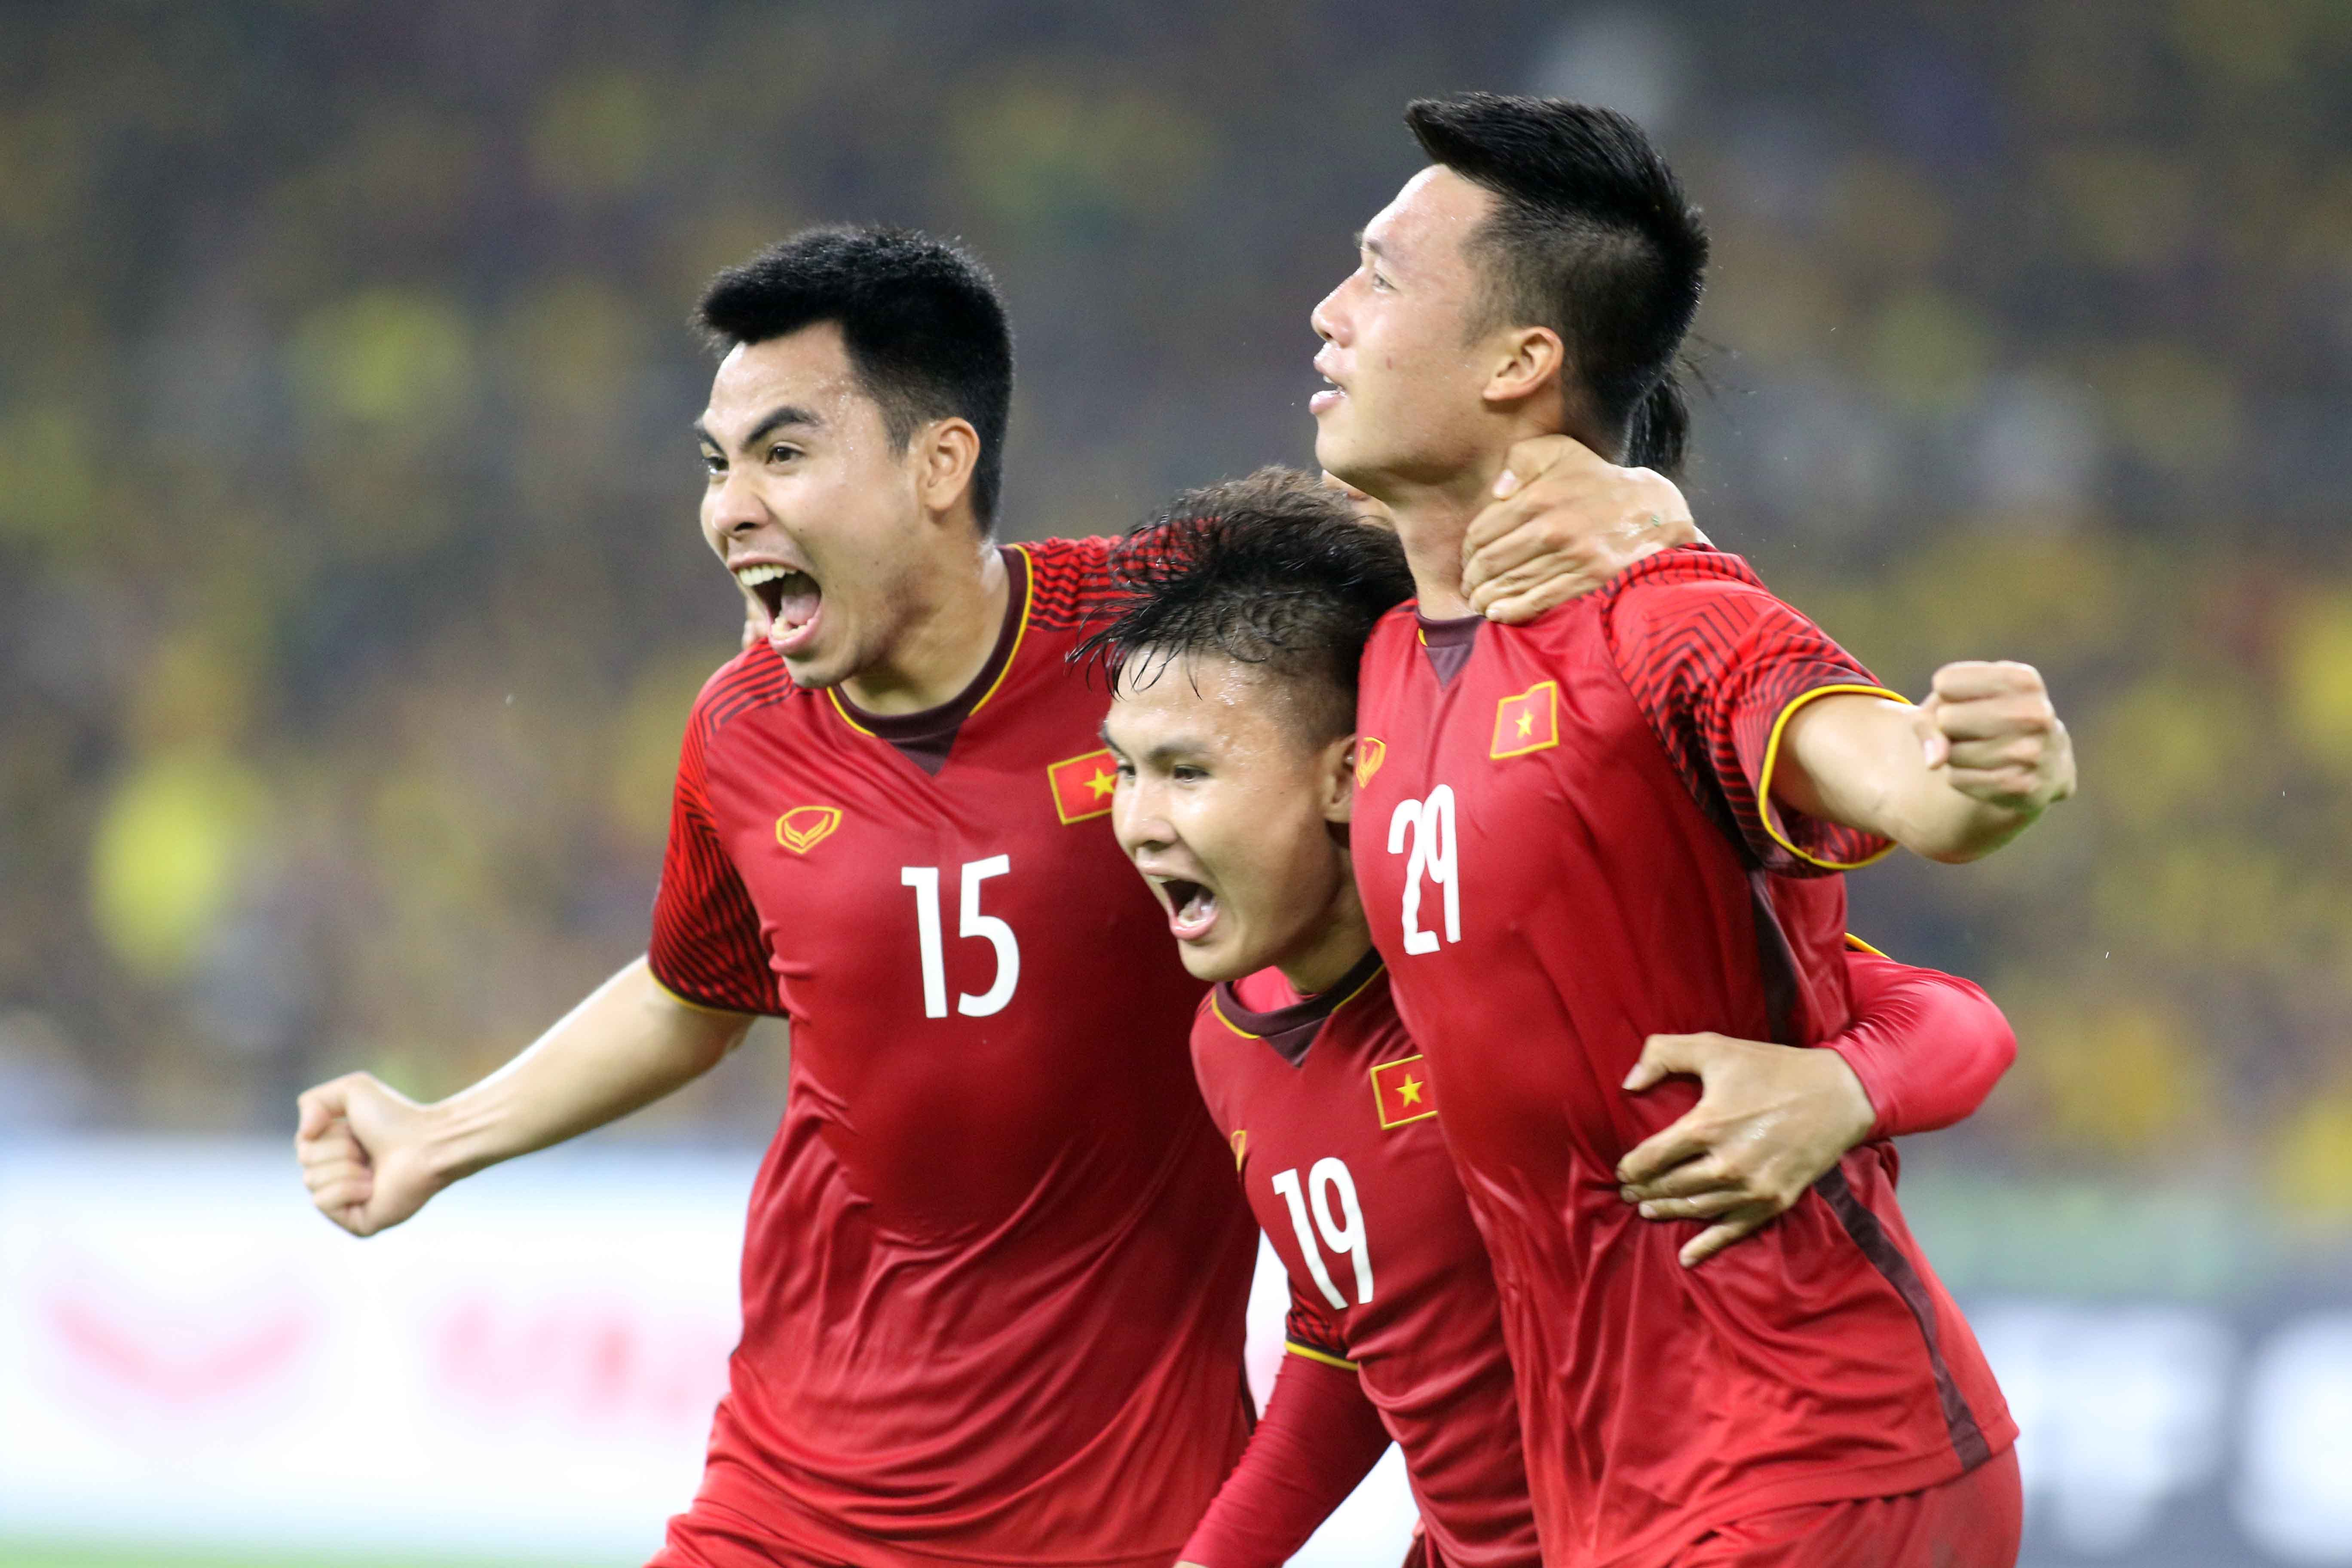 Duc Huy Quang Hai Huy Hung Vietnam Malaysia AFF Cup 2018 (2)